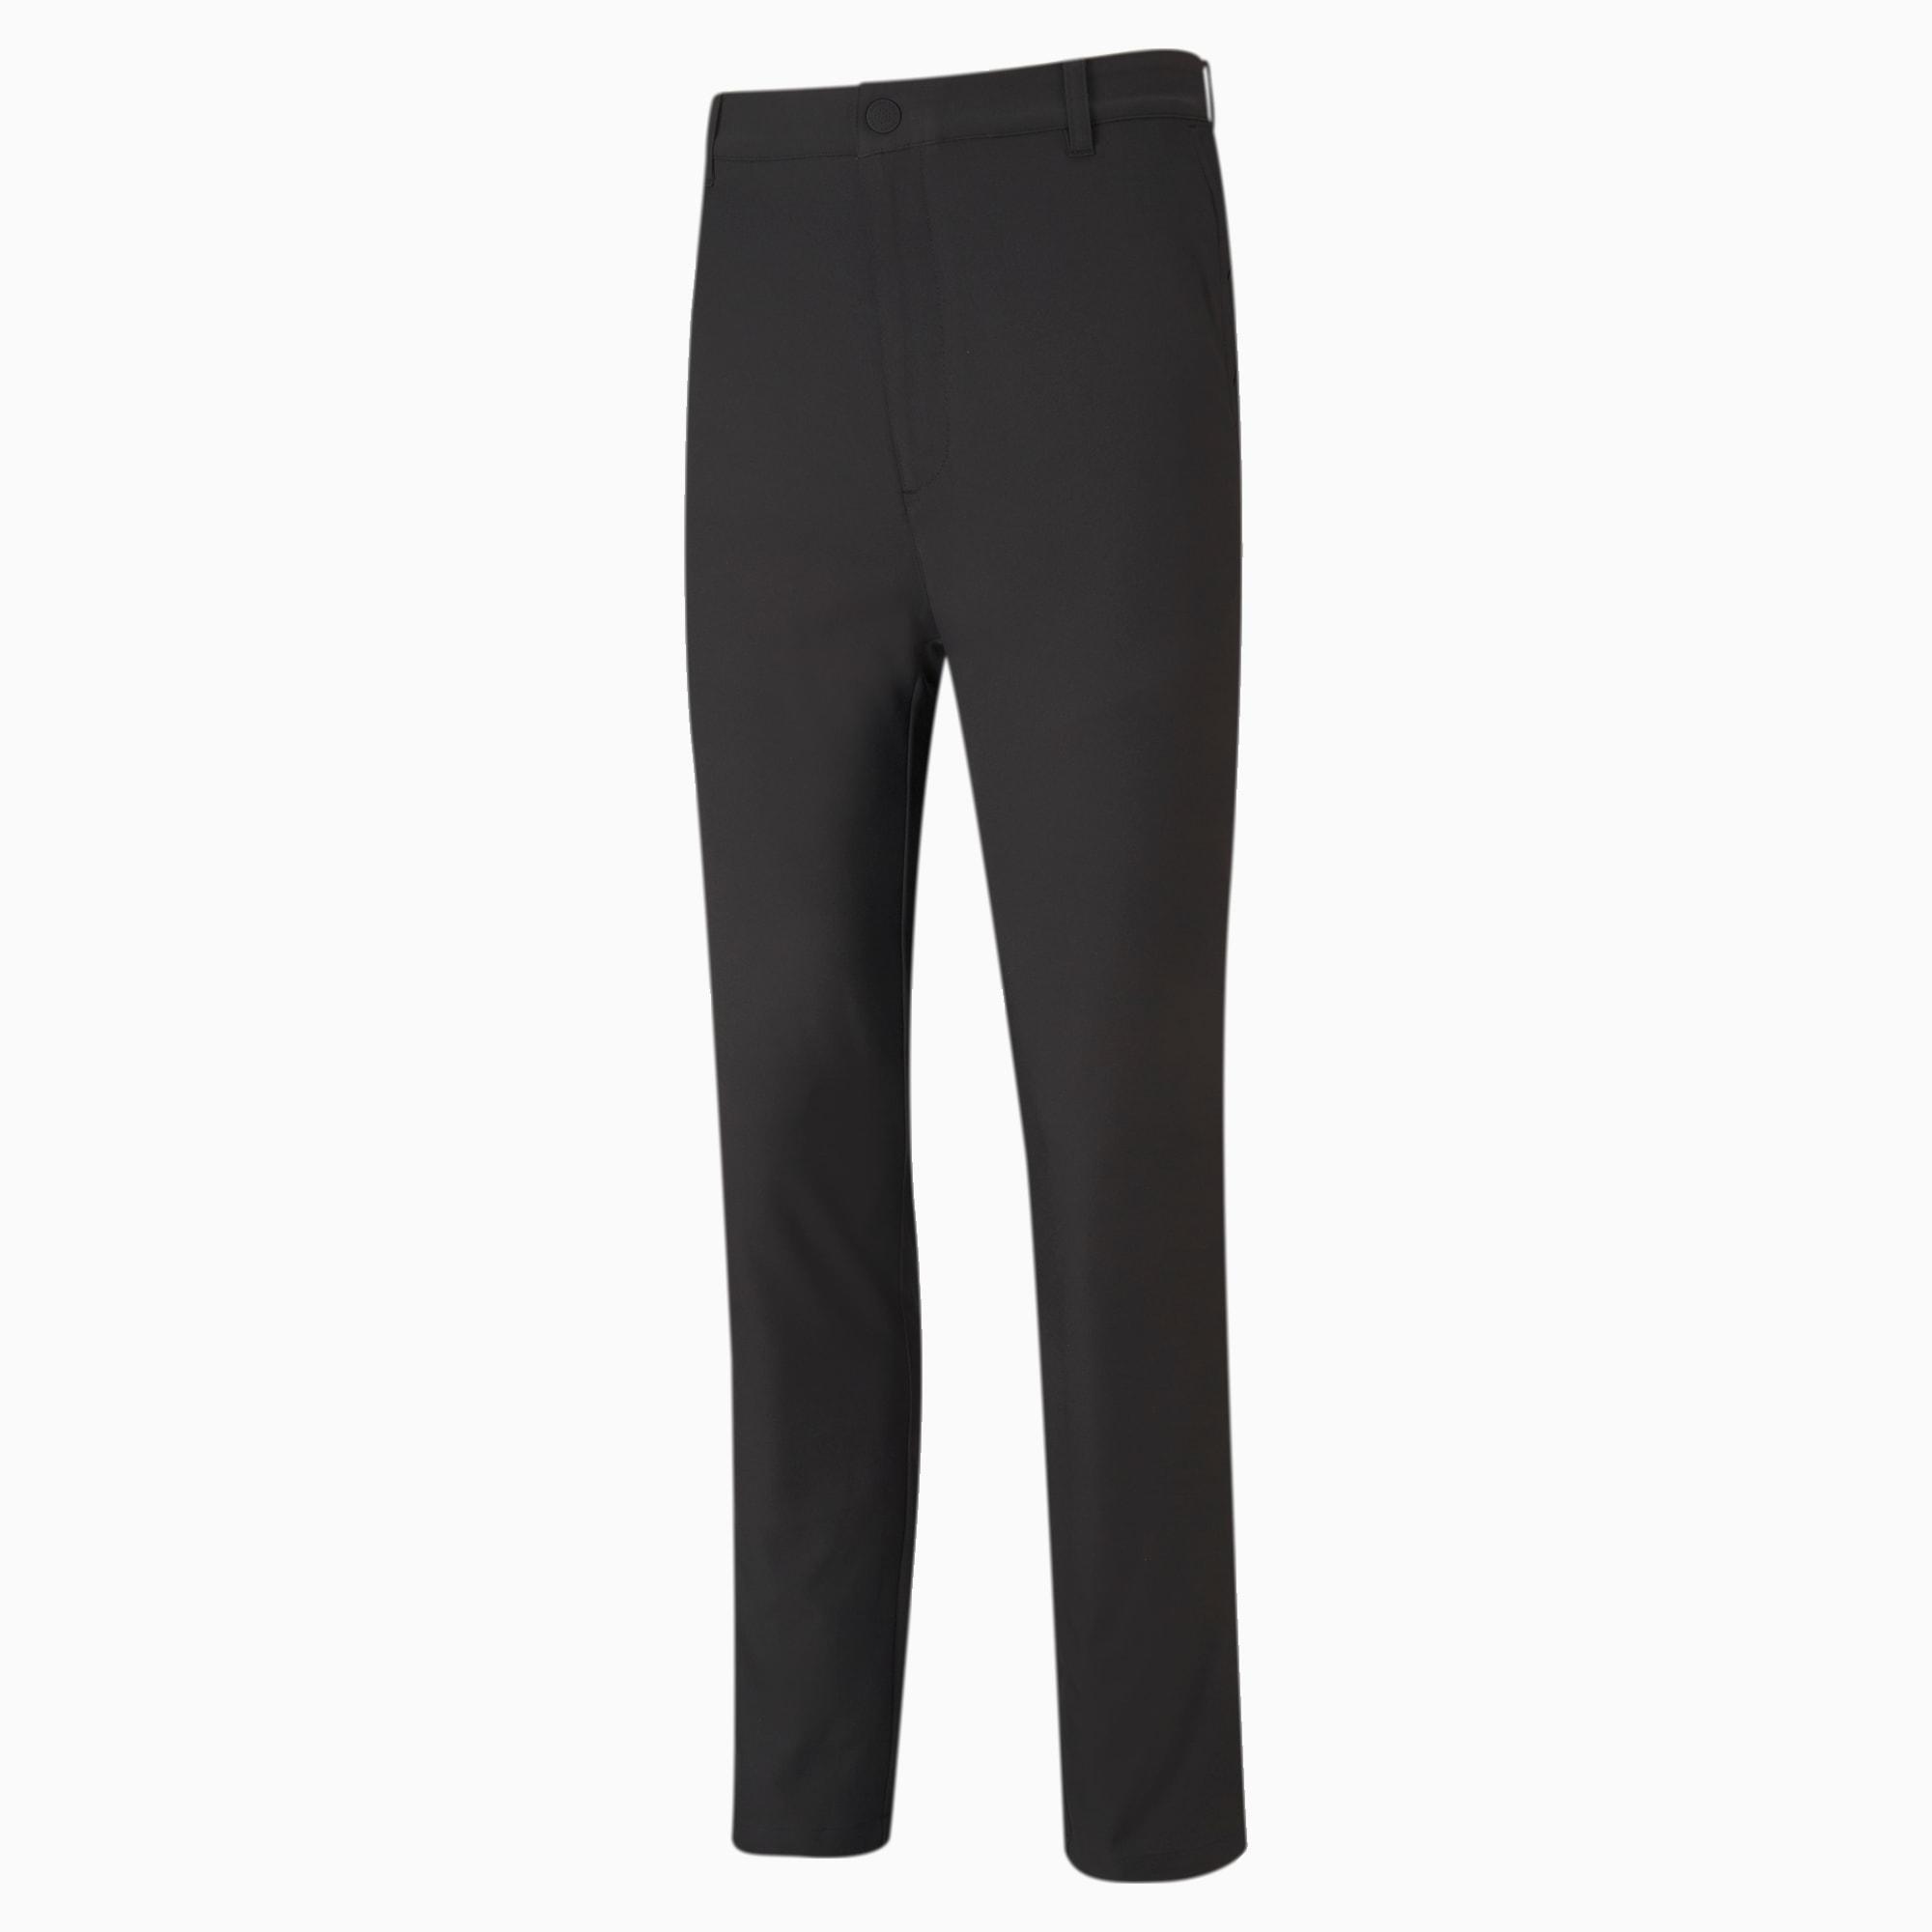 Jackpot Tailored golfbroek heren, Zwart, Maat 40/36 | PUMA